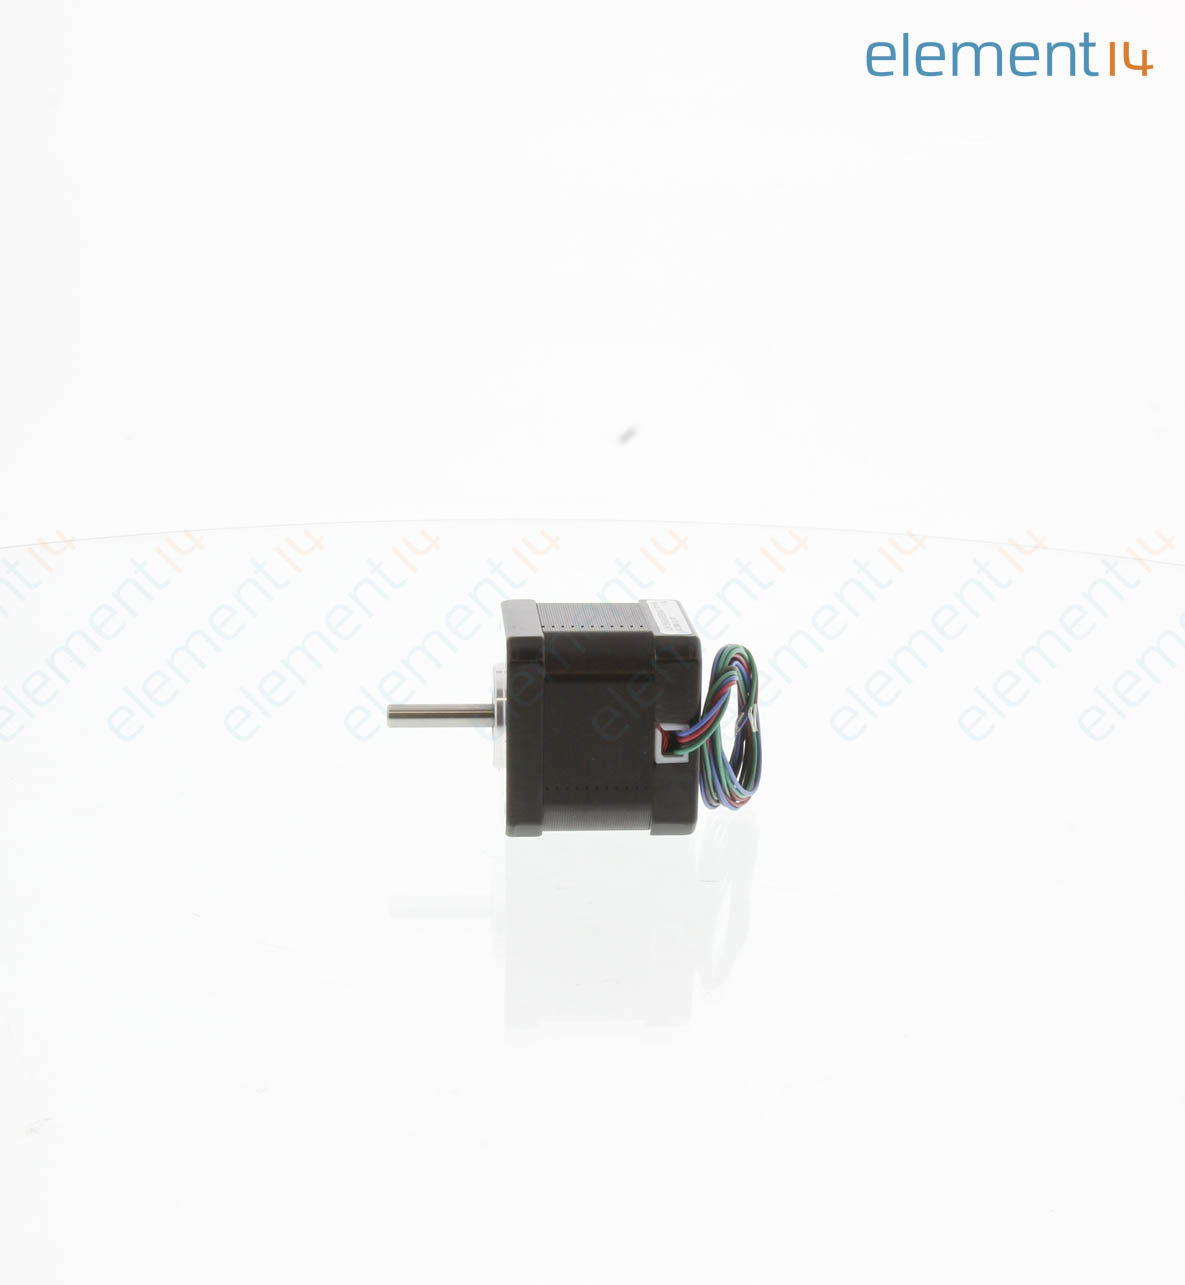 4118m 01ro Lin Engineering Stepper Motor Bipolar 044 N M Basic Circuit Supplies Steppermotor Timing Electromechanical